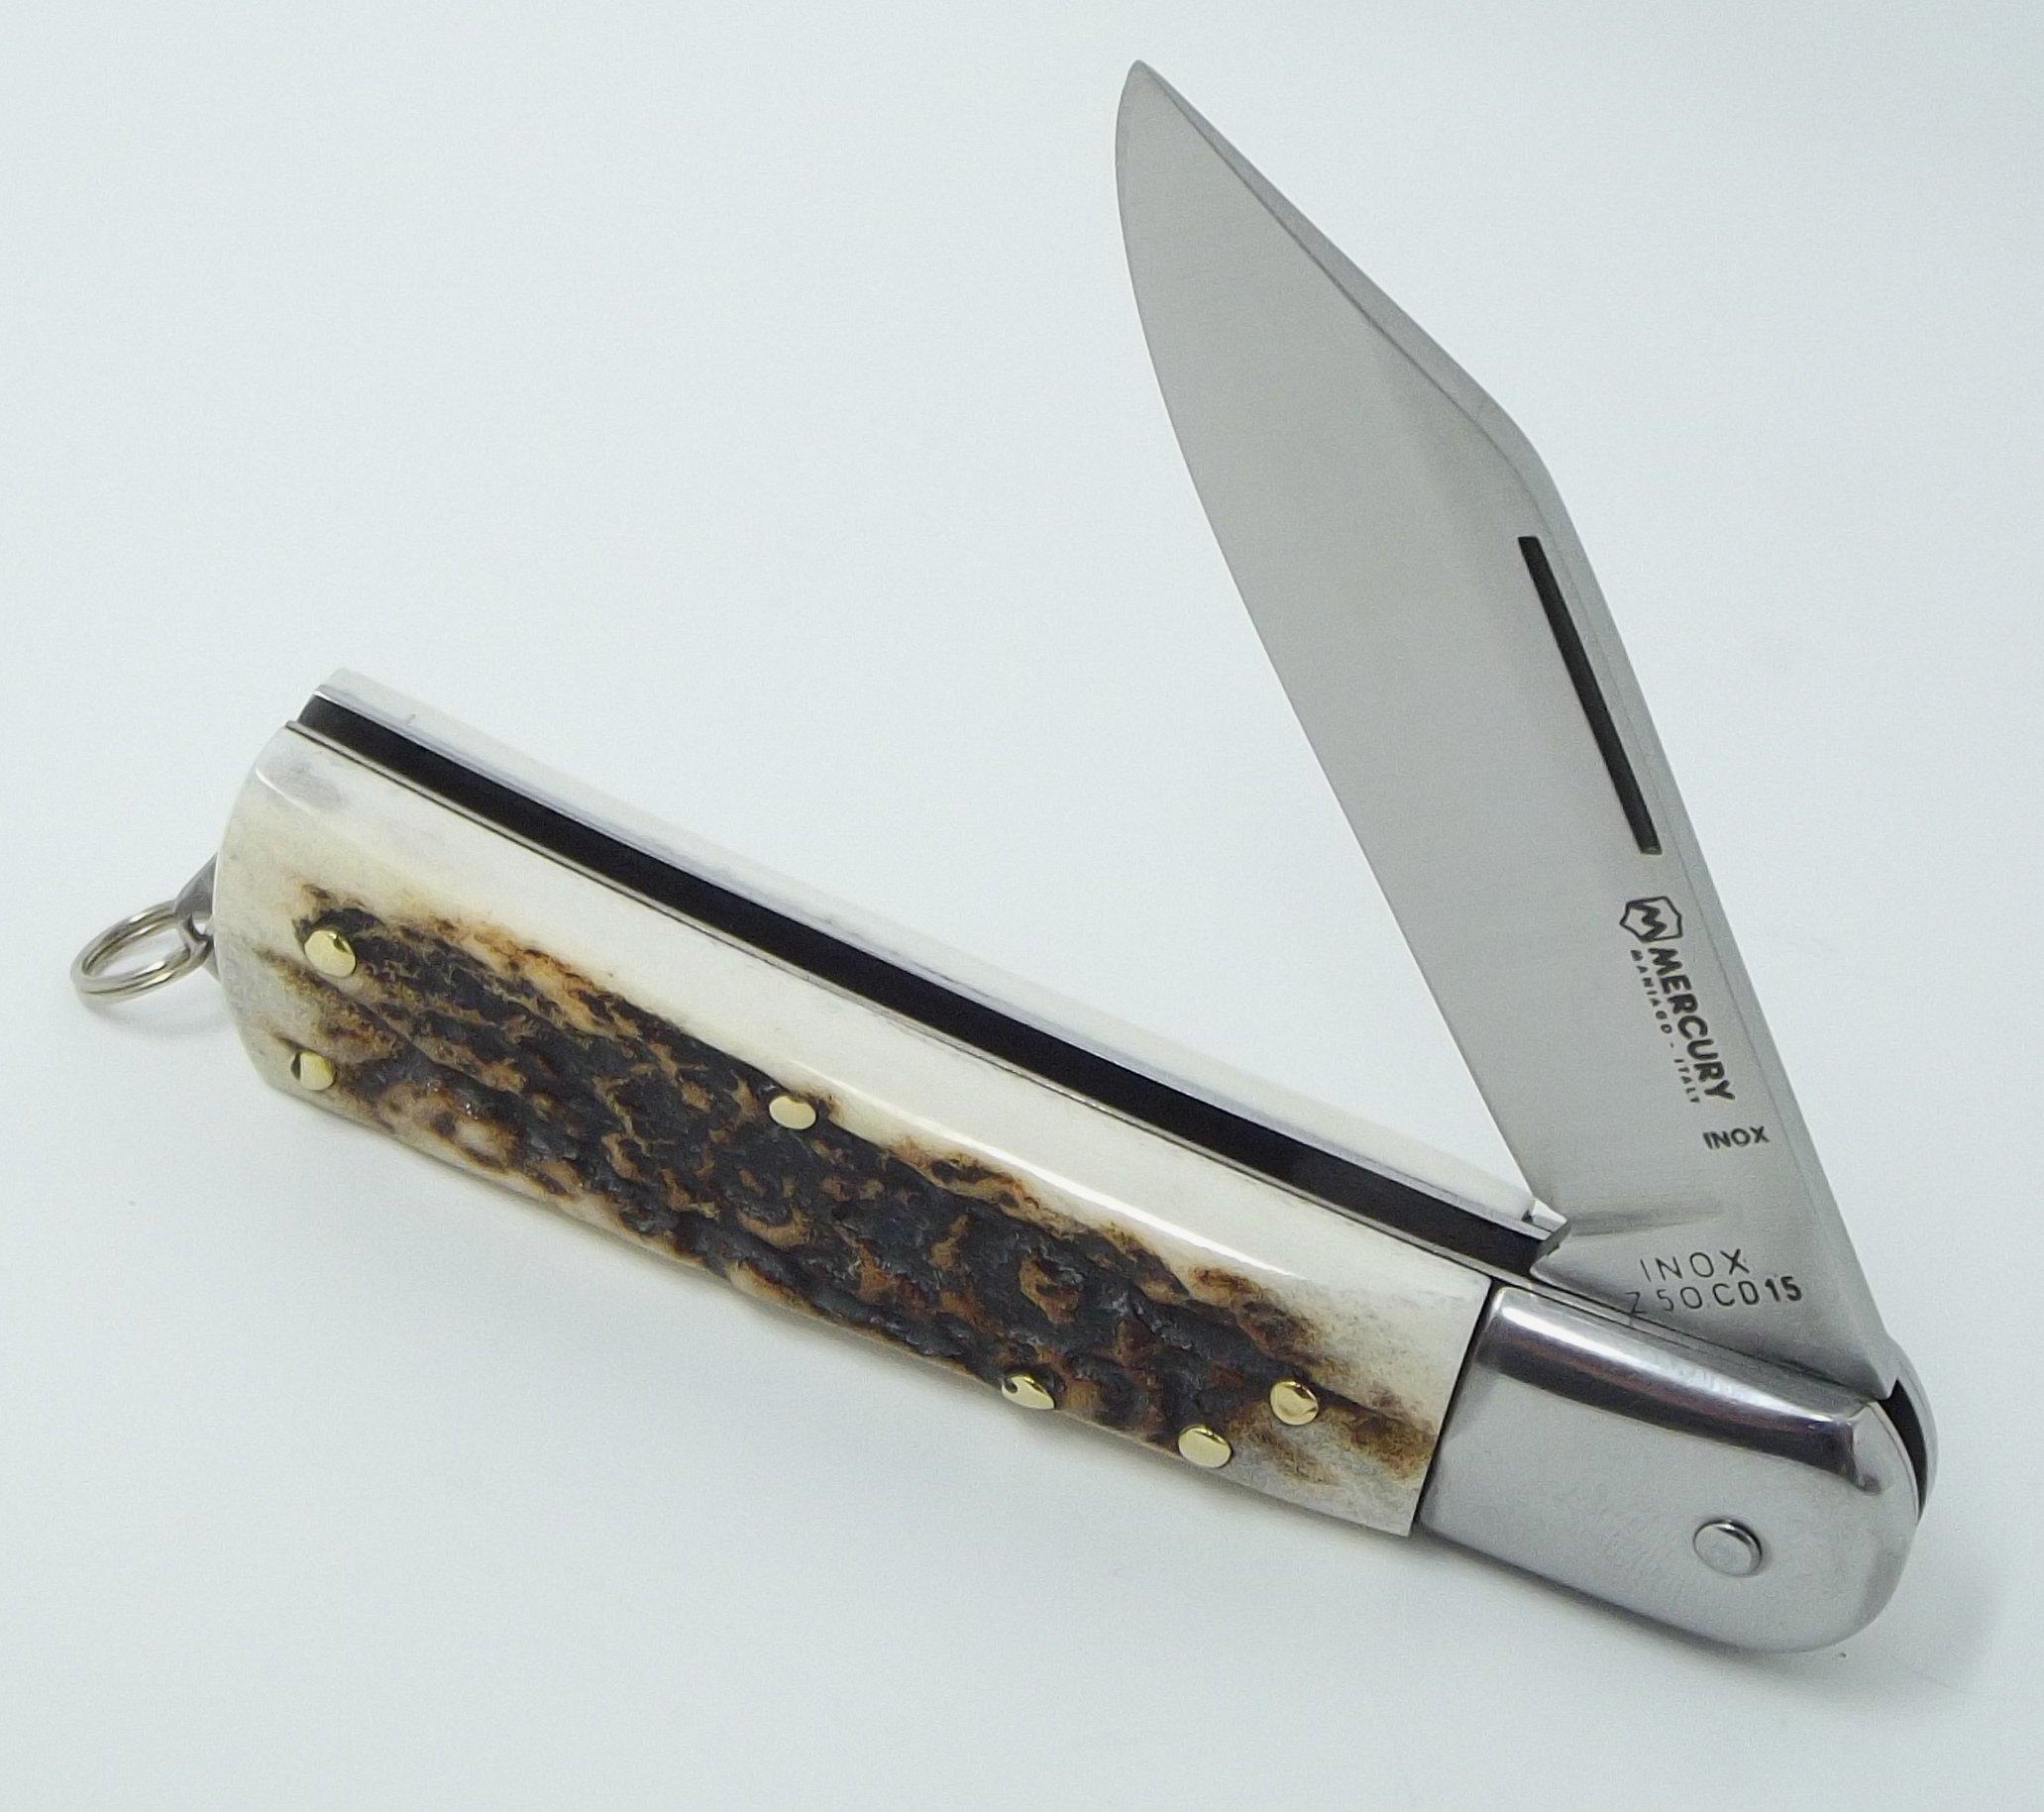 MERCURY Made in Italy Stag Handle Pocket Knife Clip Point Blade INOX Steel Lockback